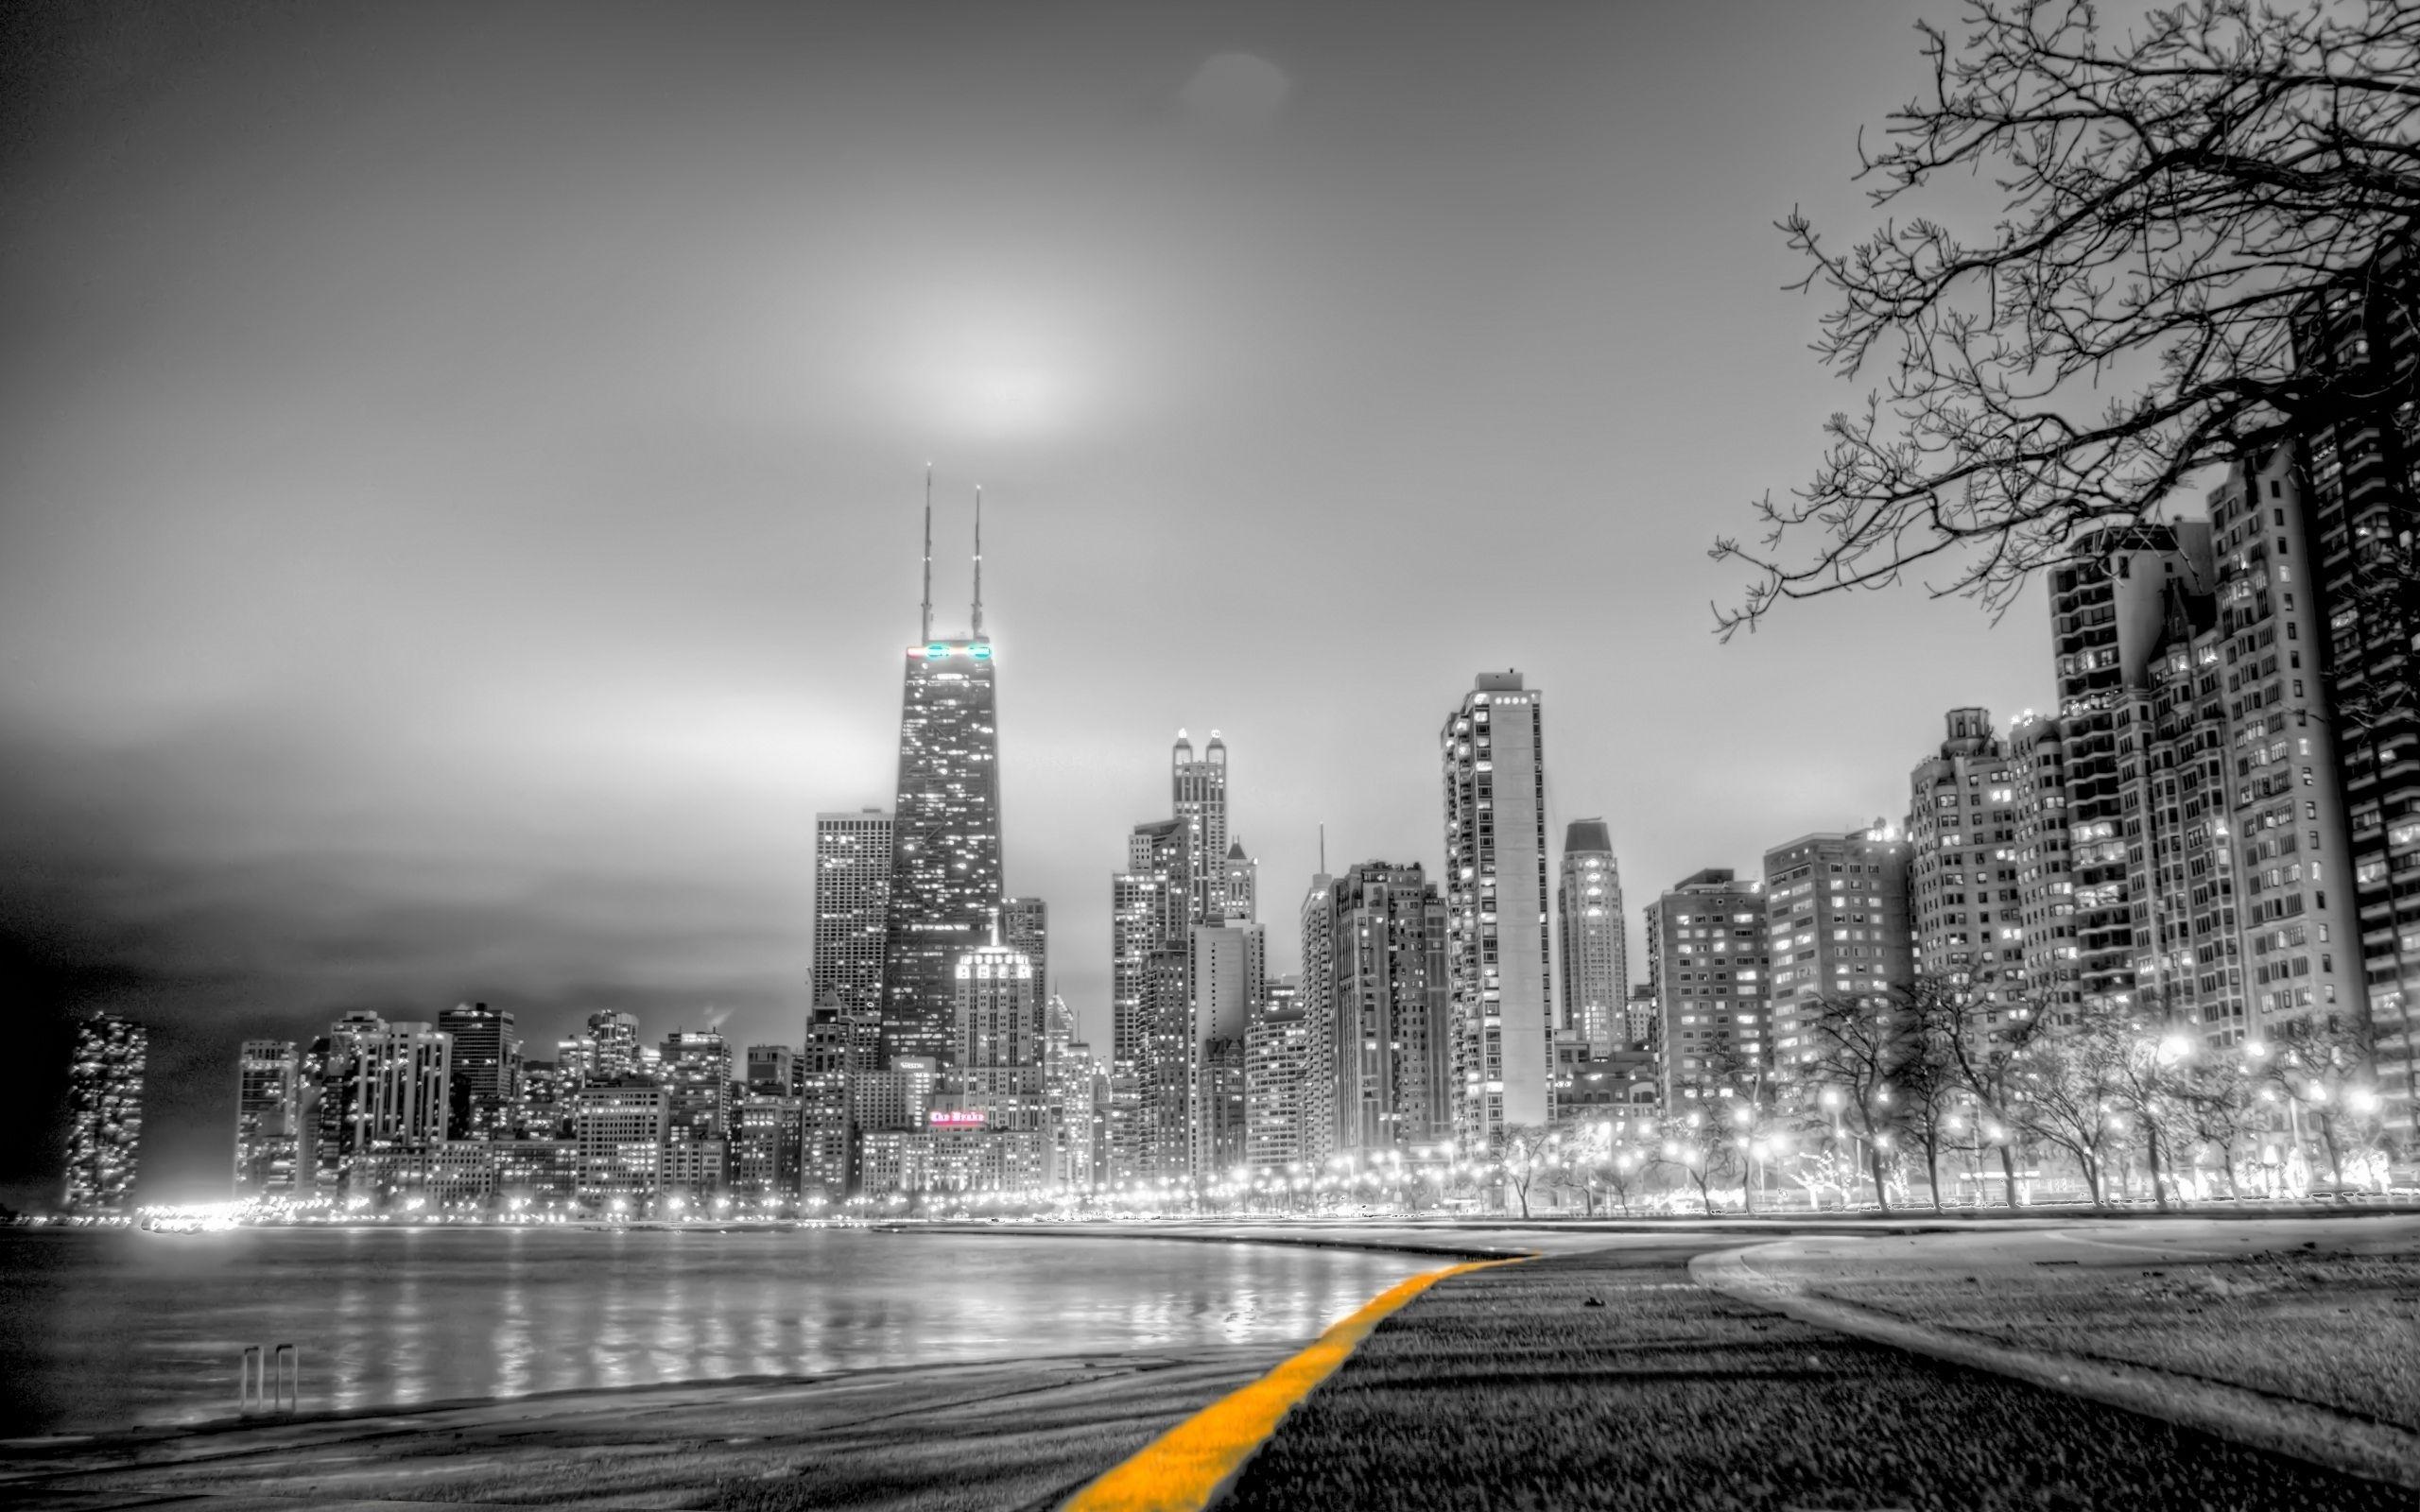 chicago black and white pinterest chicago city wallpaper black and white city picture wallpaper